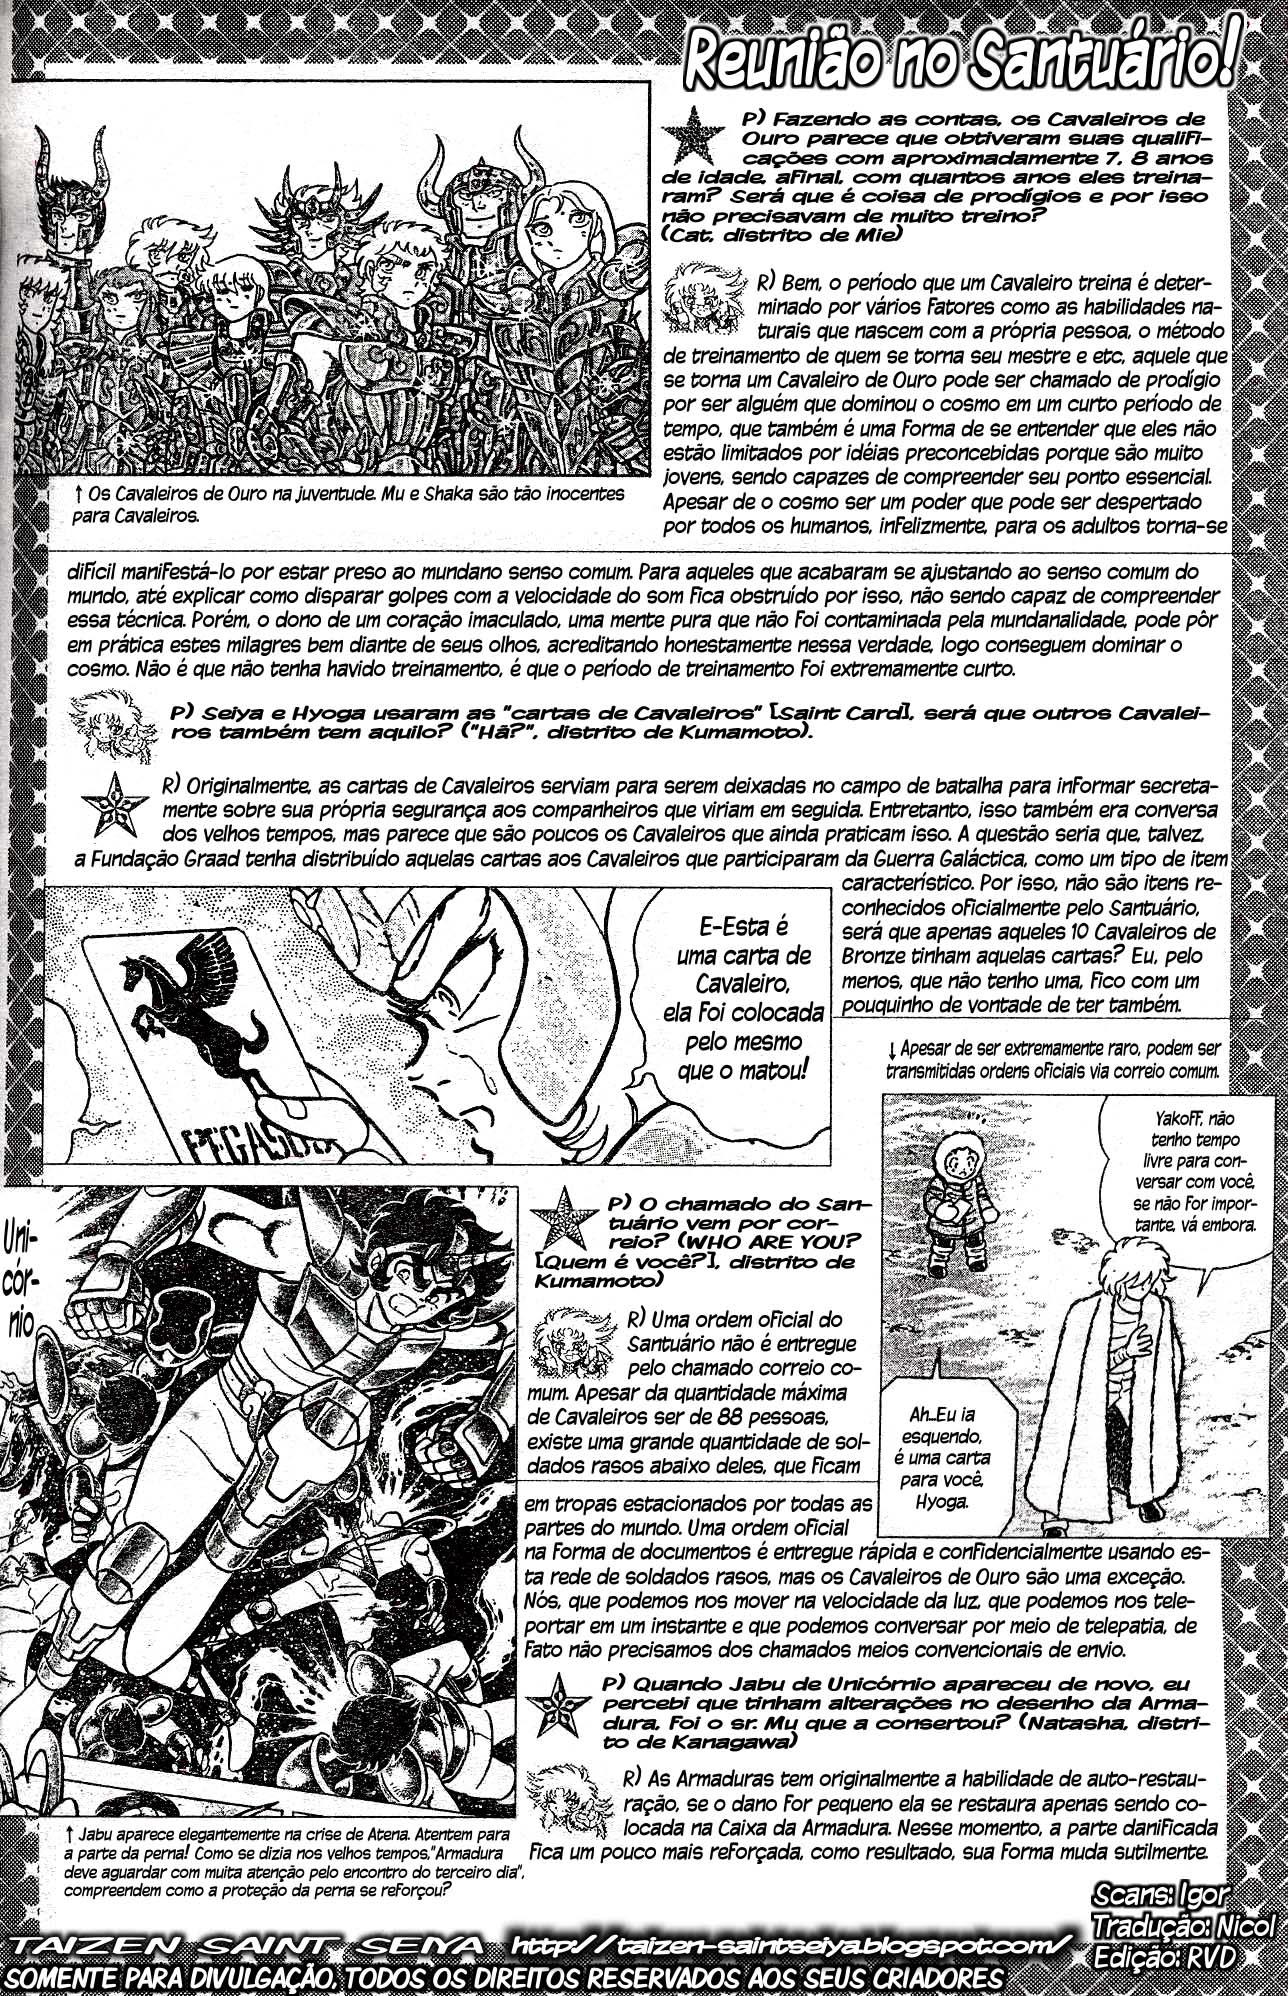 Mú de Áries vs Saga de Gêmeos - Página 17 Scanlation-tokumori03-012